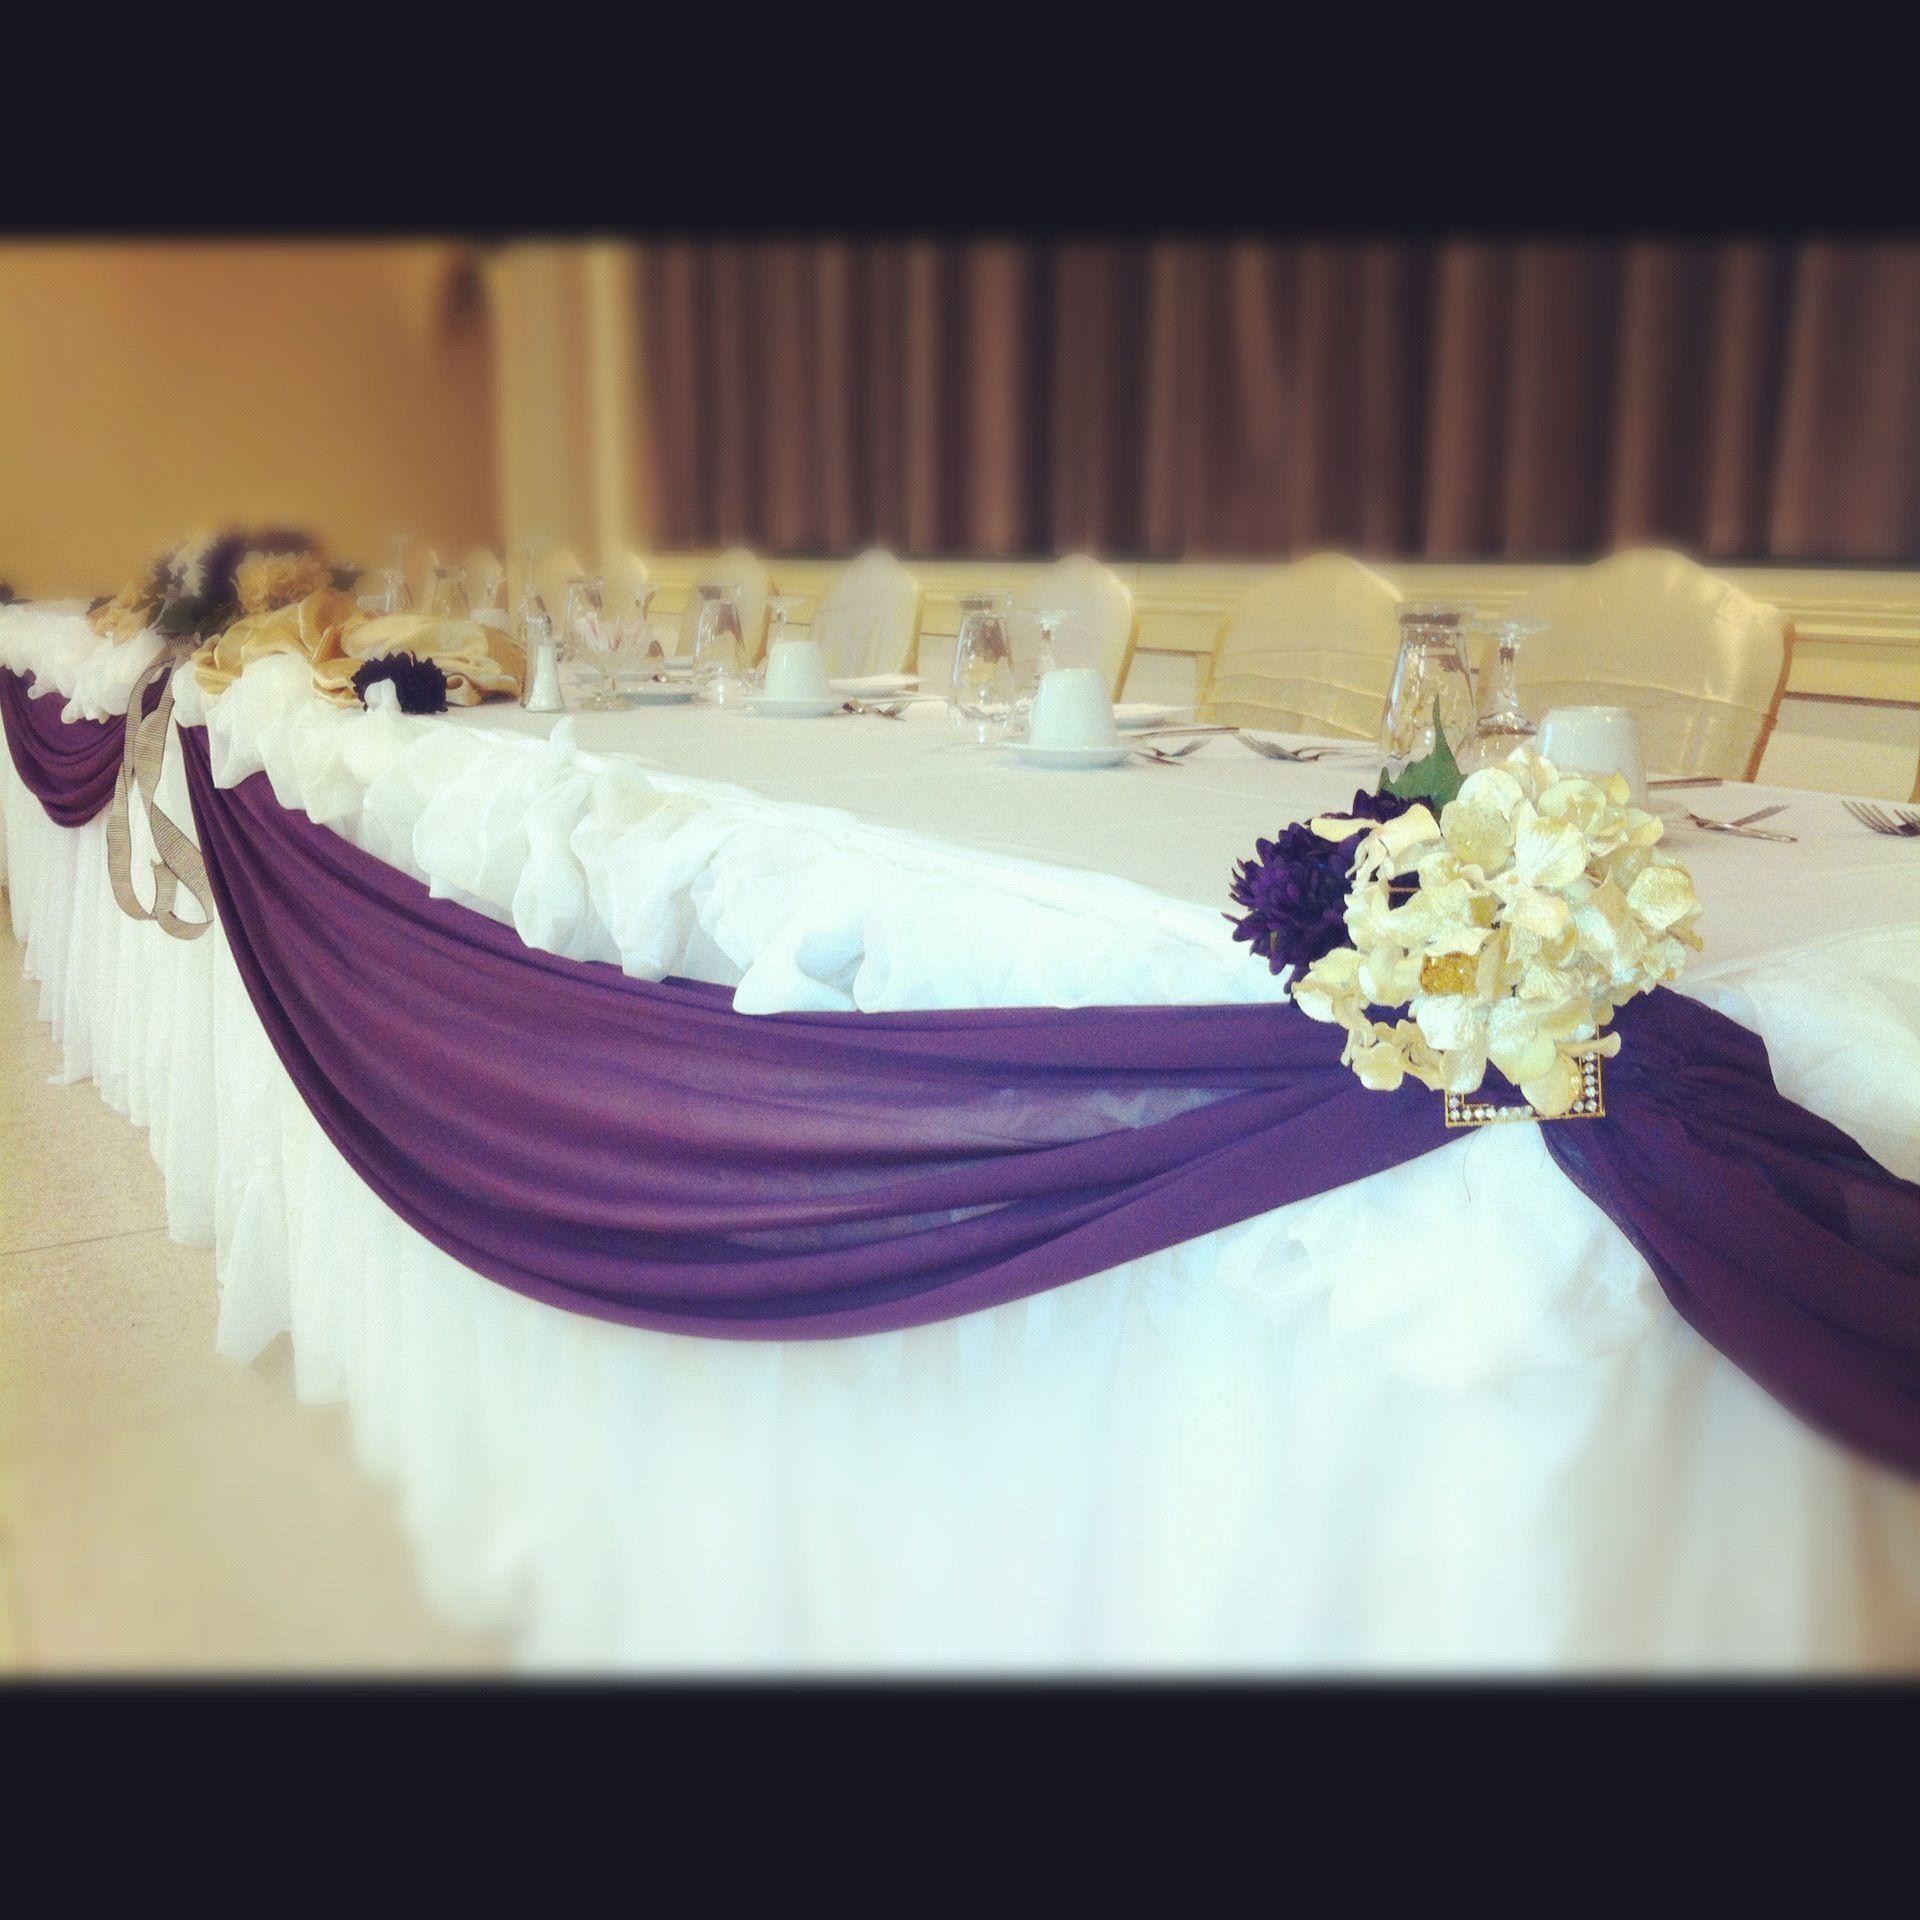 Wedding Head Table Decoration Ideas: Elegant Eggplant Head Table Wedding Decorations